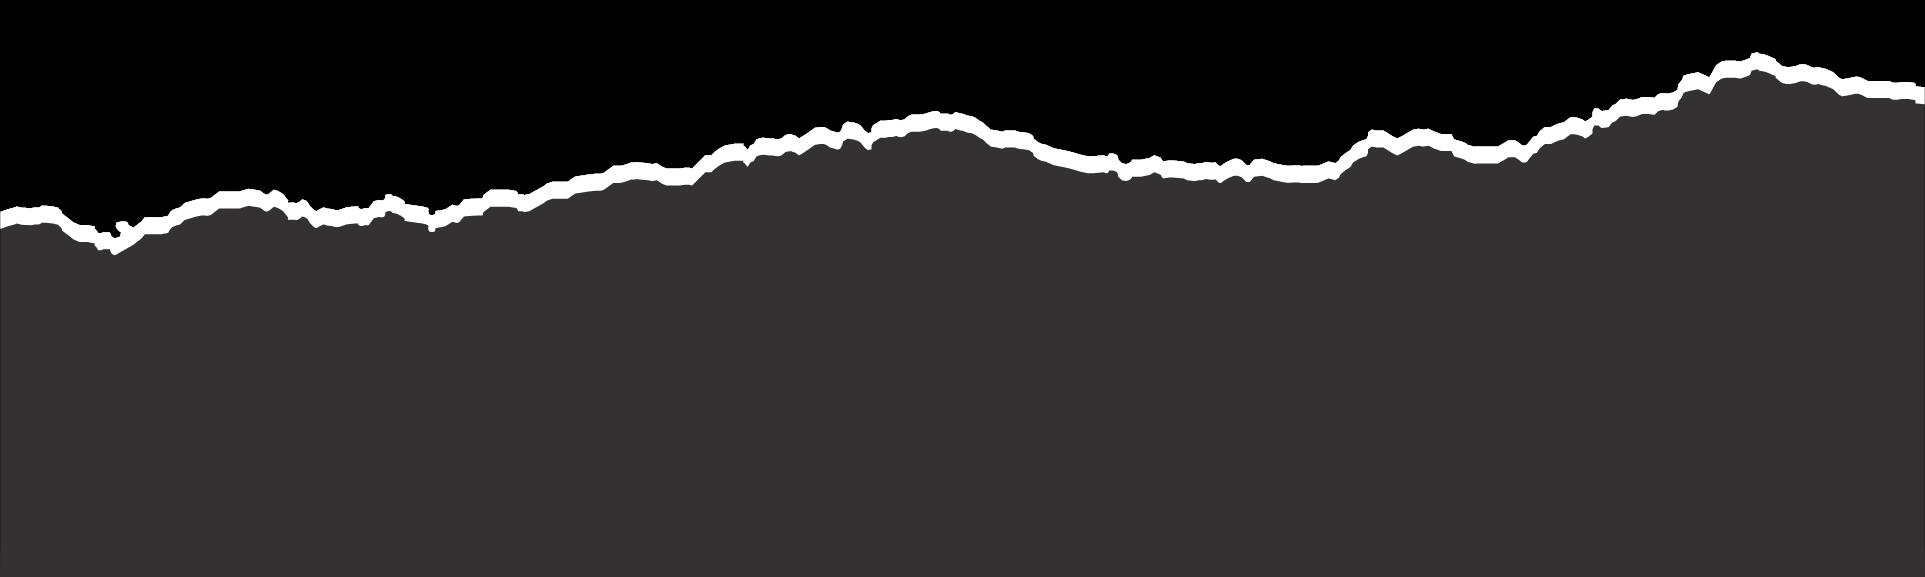 NitroTaps - Website Sketch 01-17.png